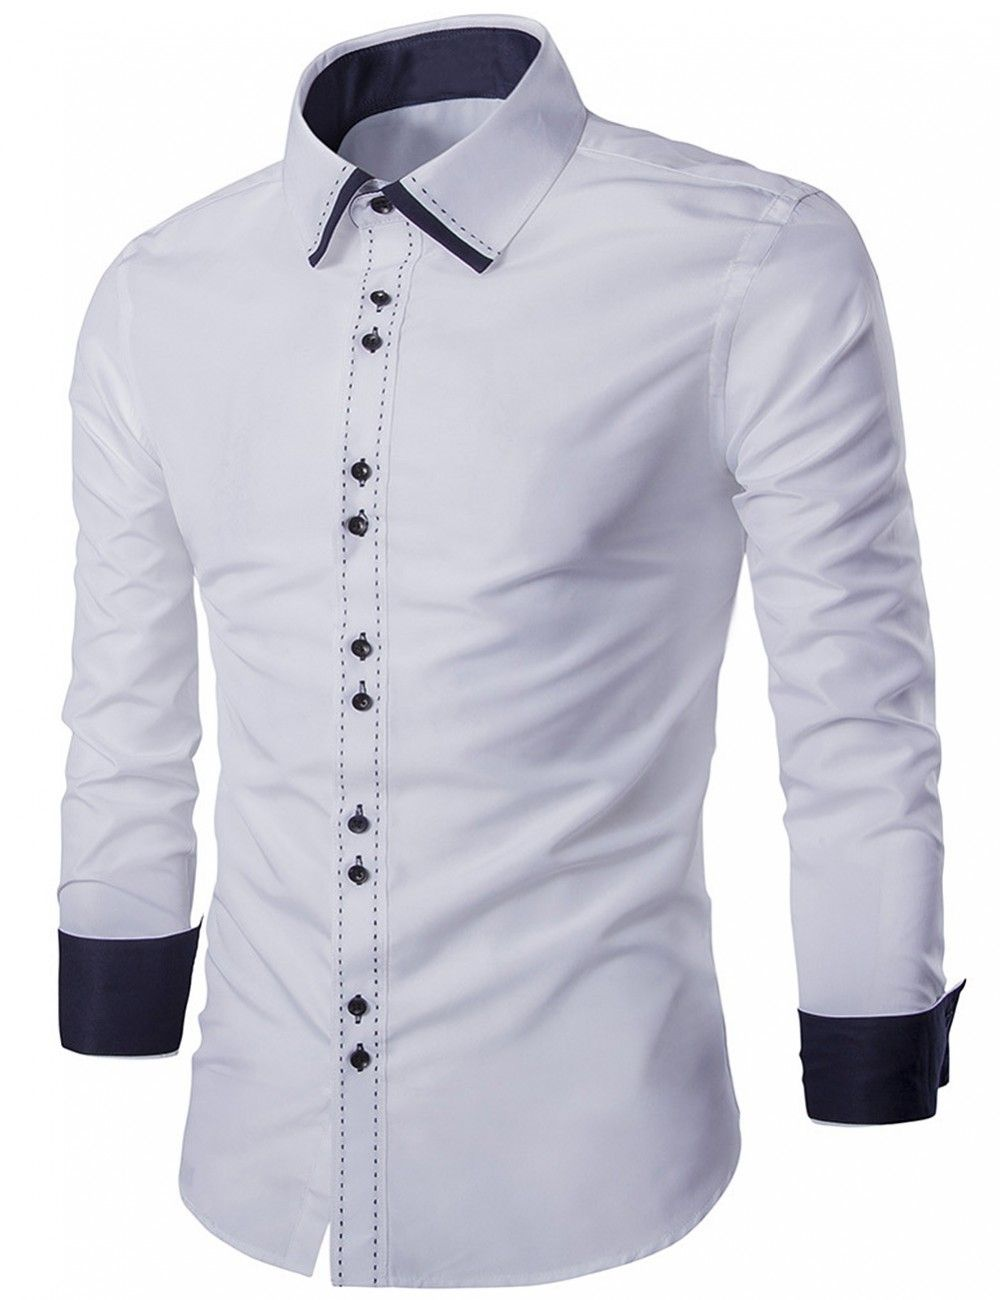 02675cfdd8 Yesfashion Men's Collar Bump Color Hand Stitching Shirt White M - Tee &  Tank Top - Men